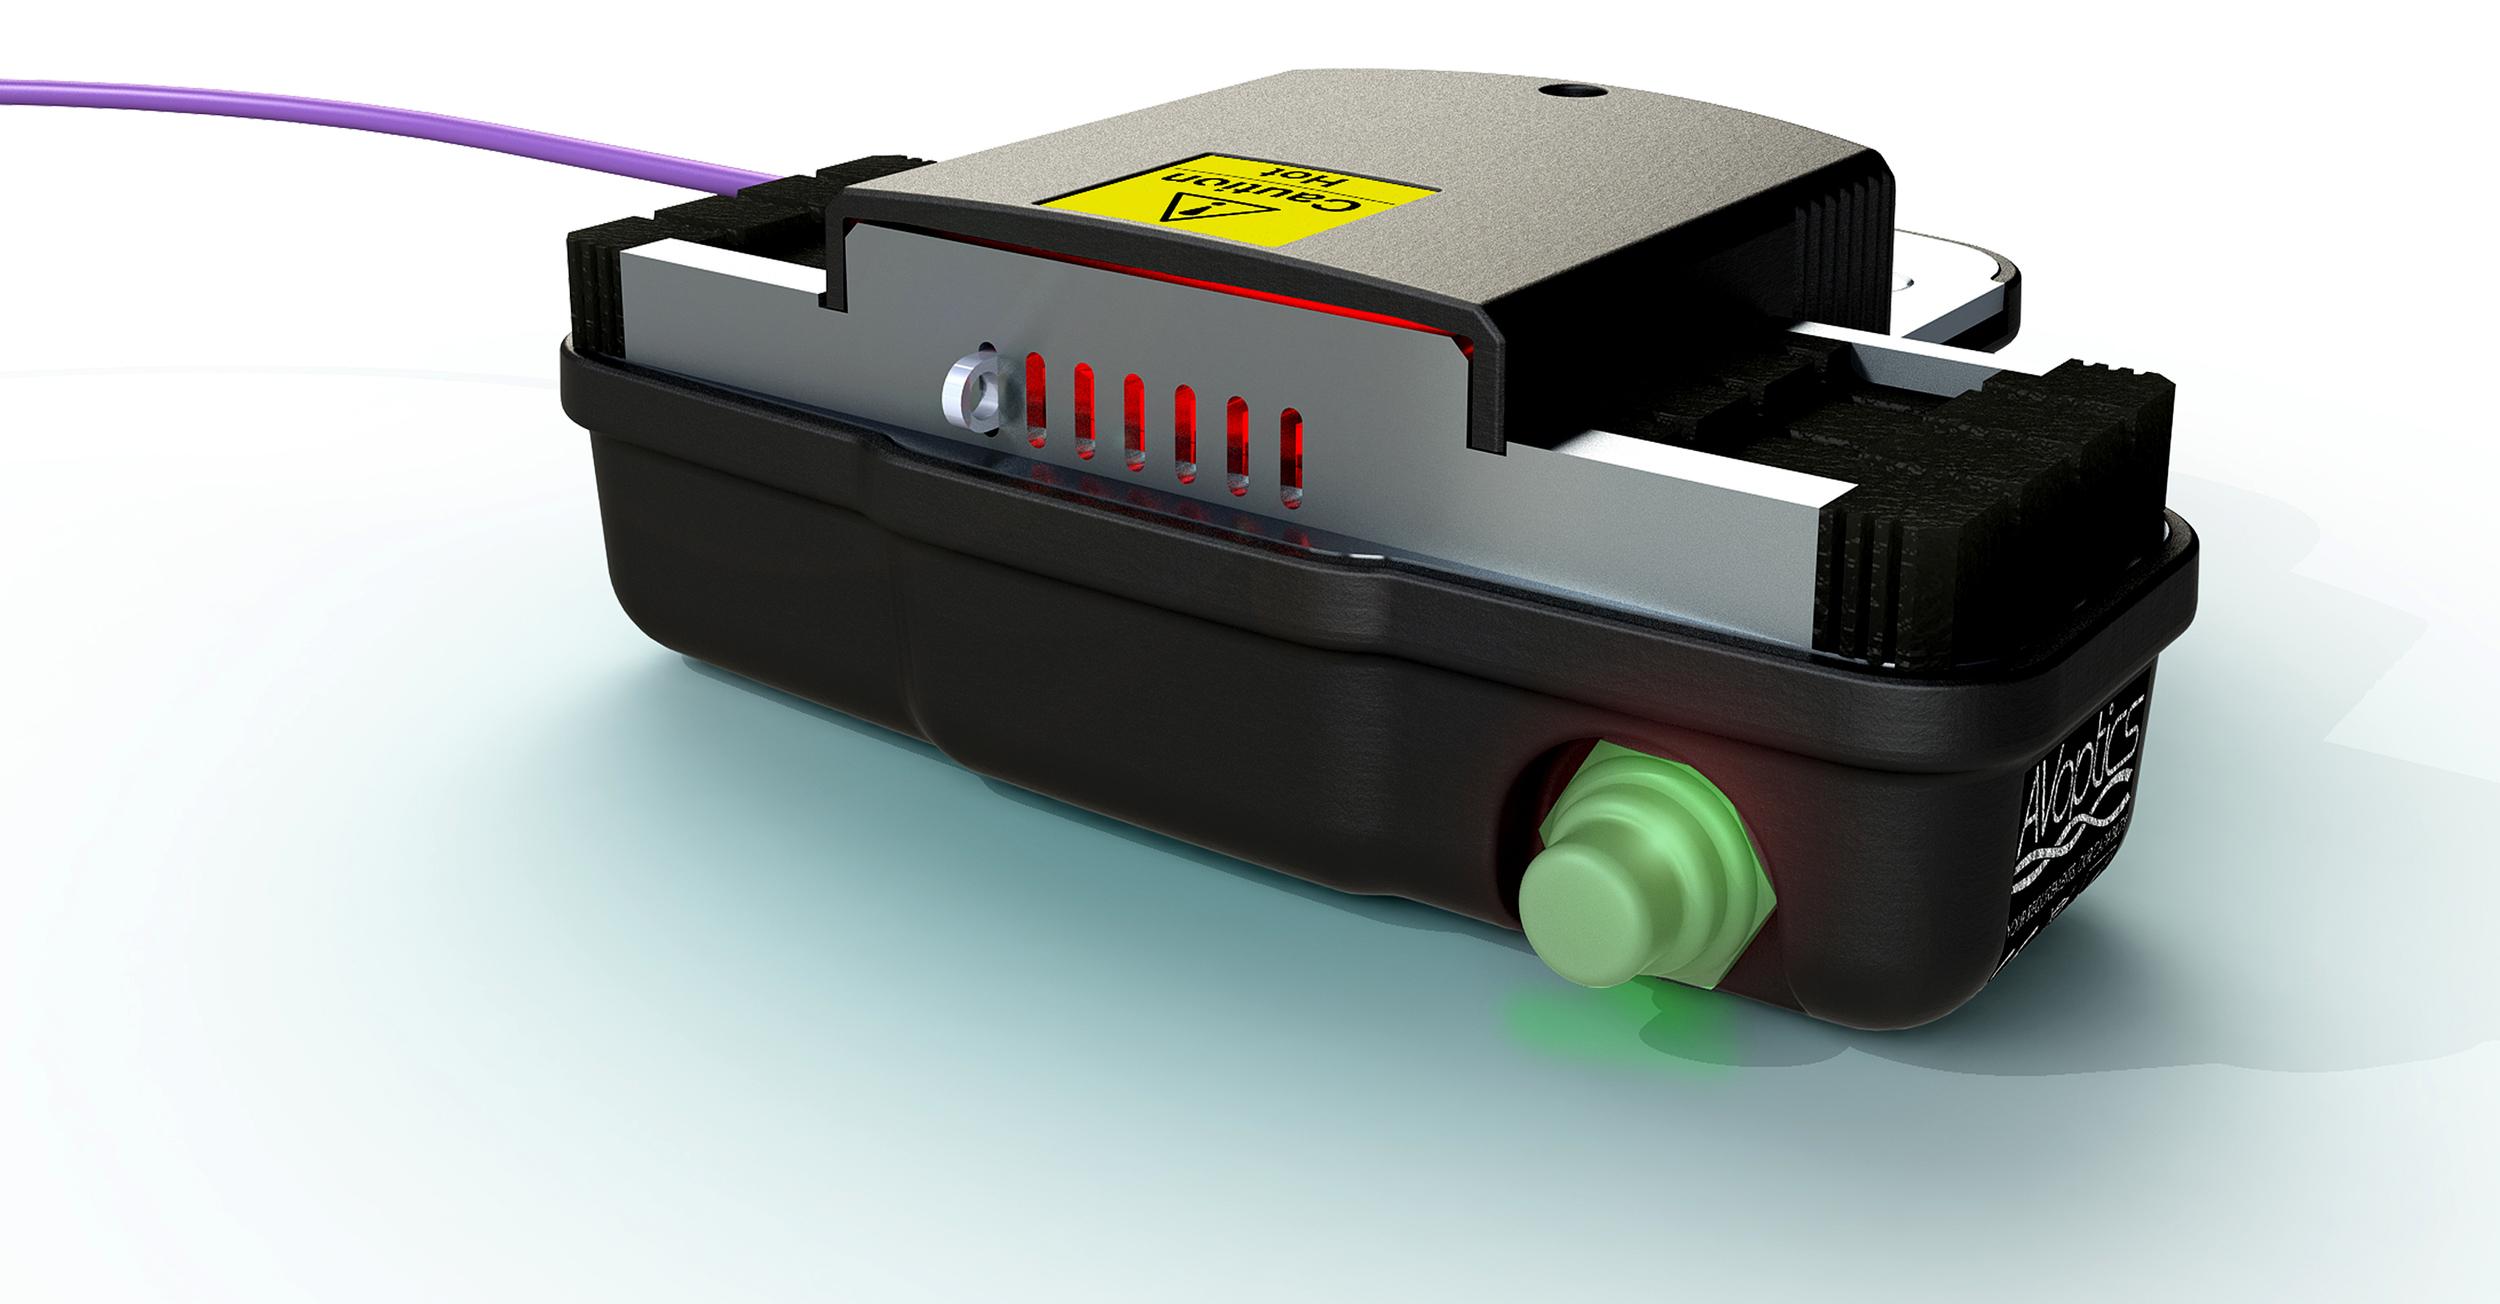 AV Optics  - Value engineering and ergonomics for this fibre optic device